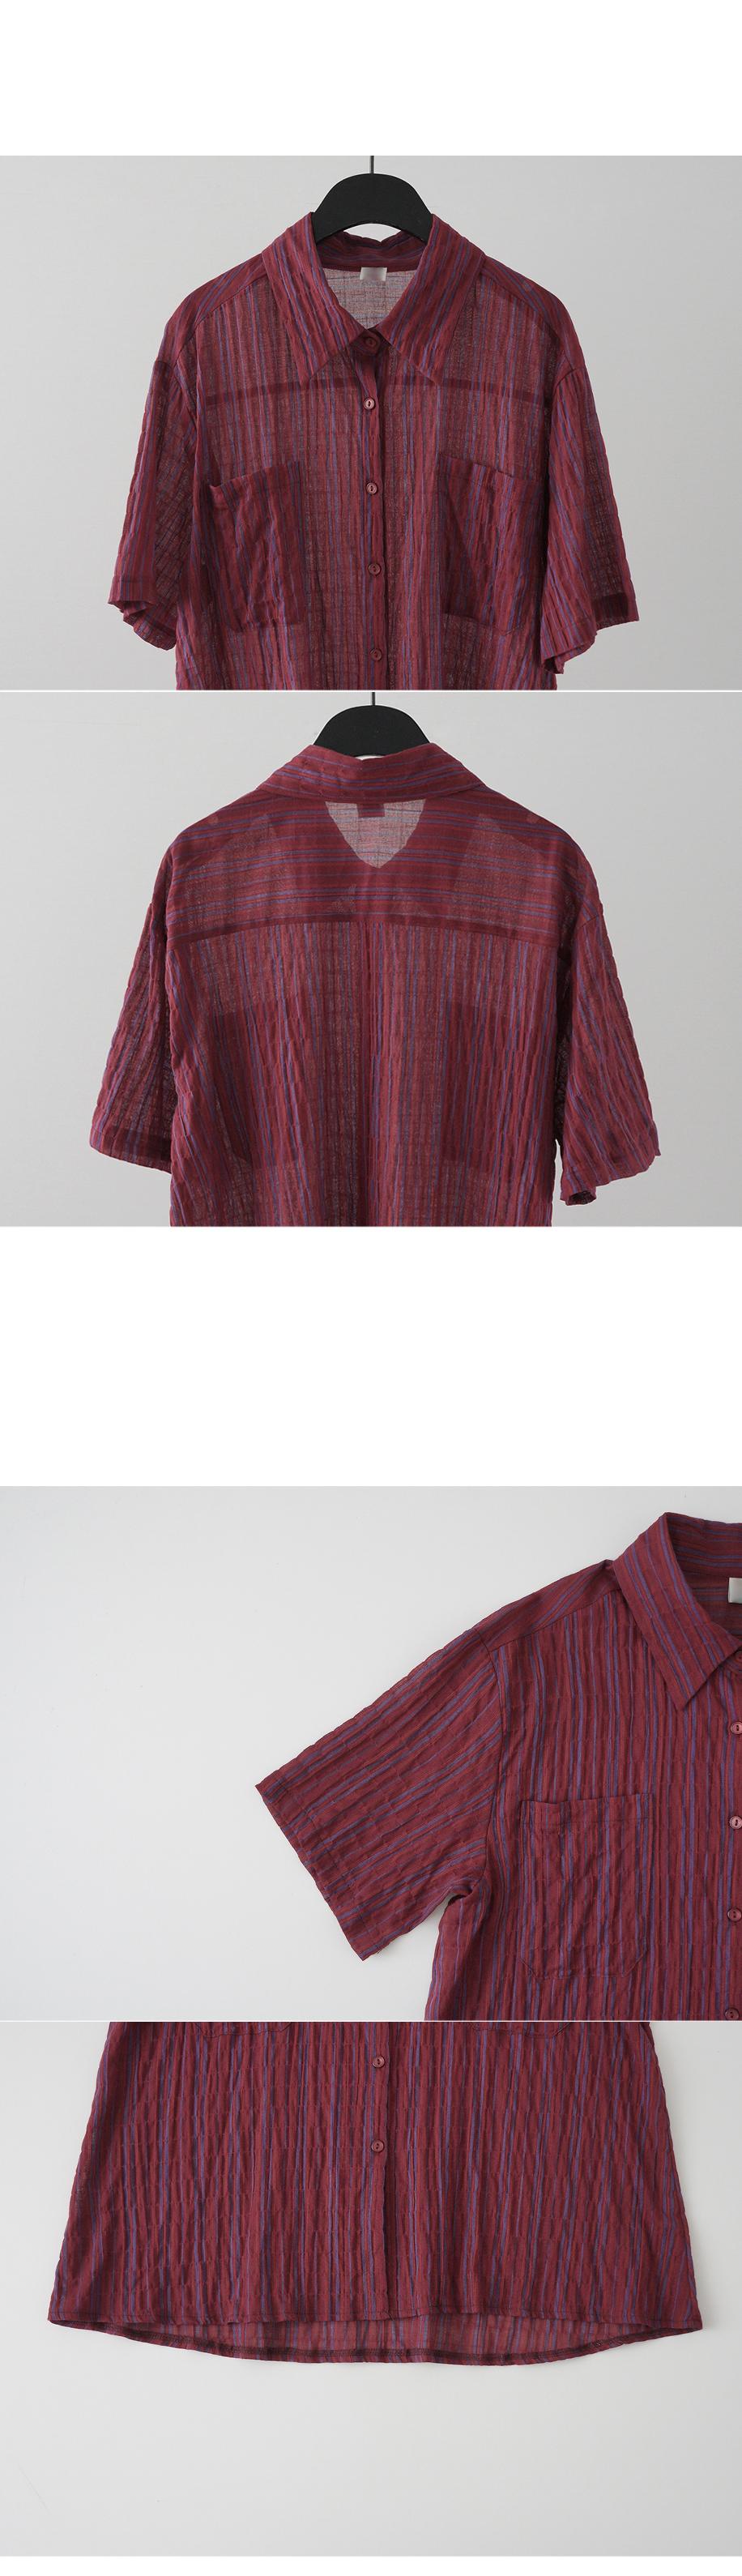 vintage stripe shirts